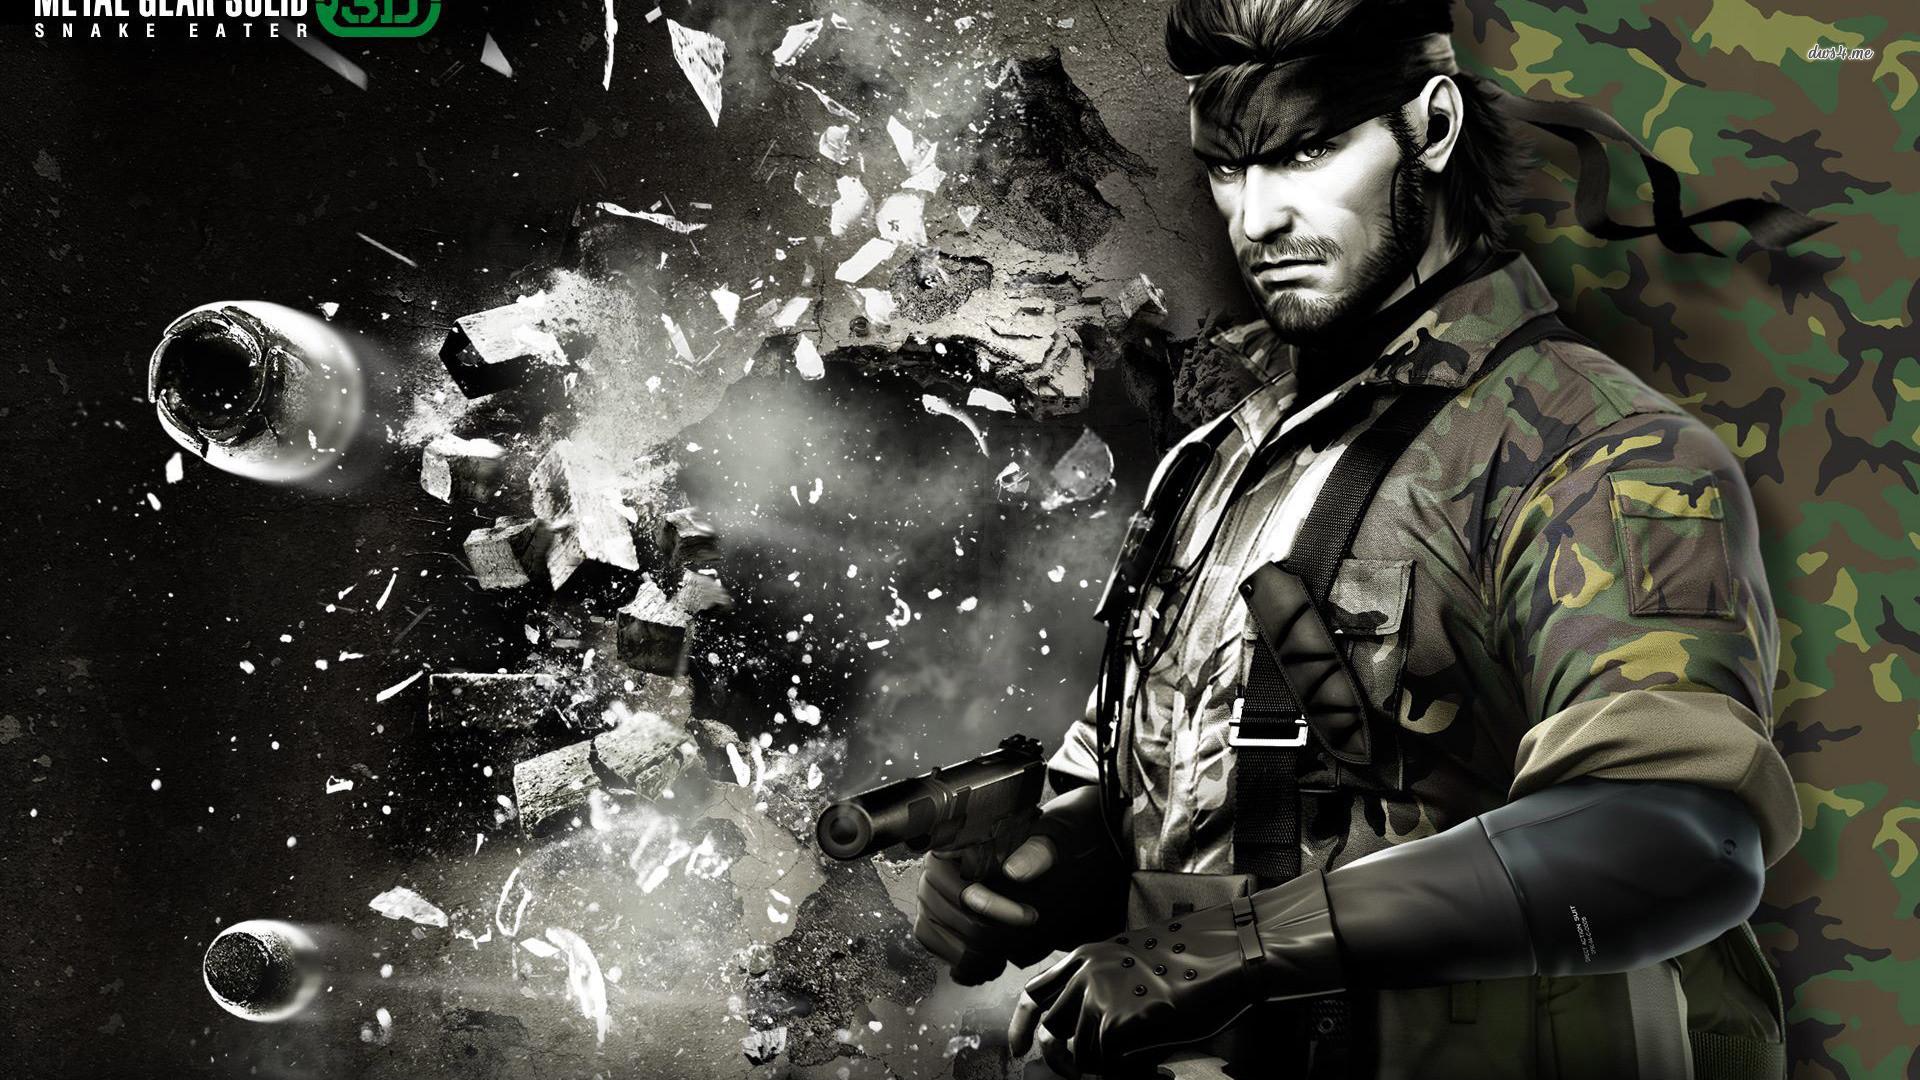 Metal Gear Solid HD Wallpapers Backgrounds Wallpaper · Big Boss …